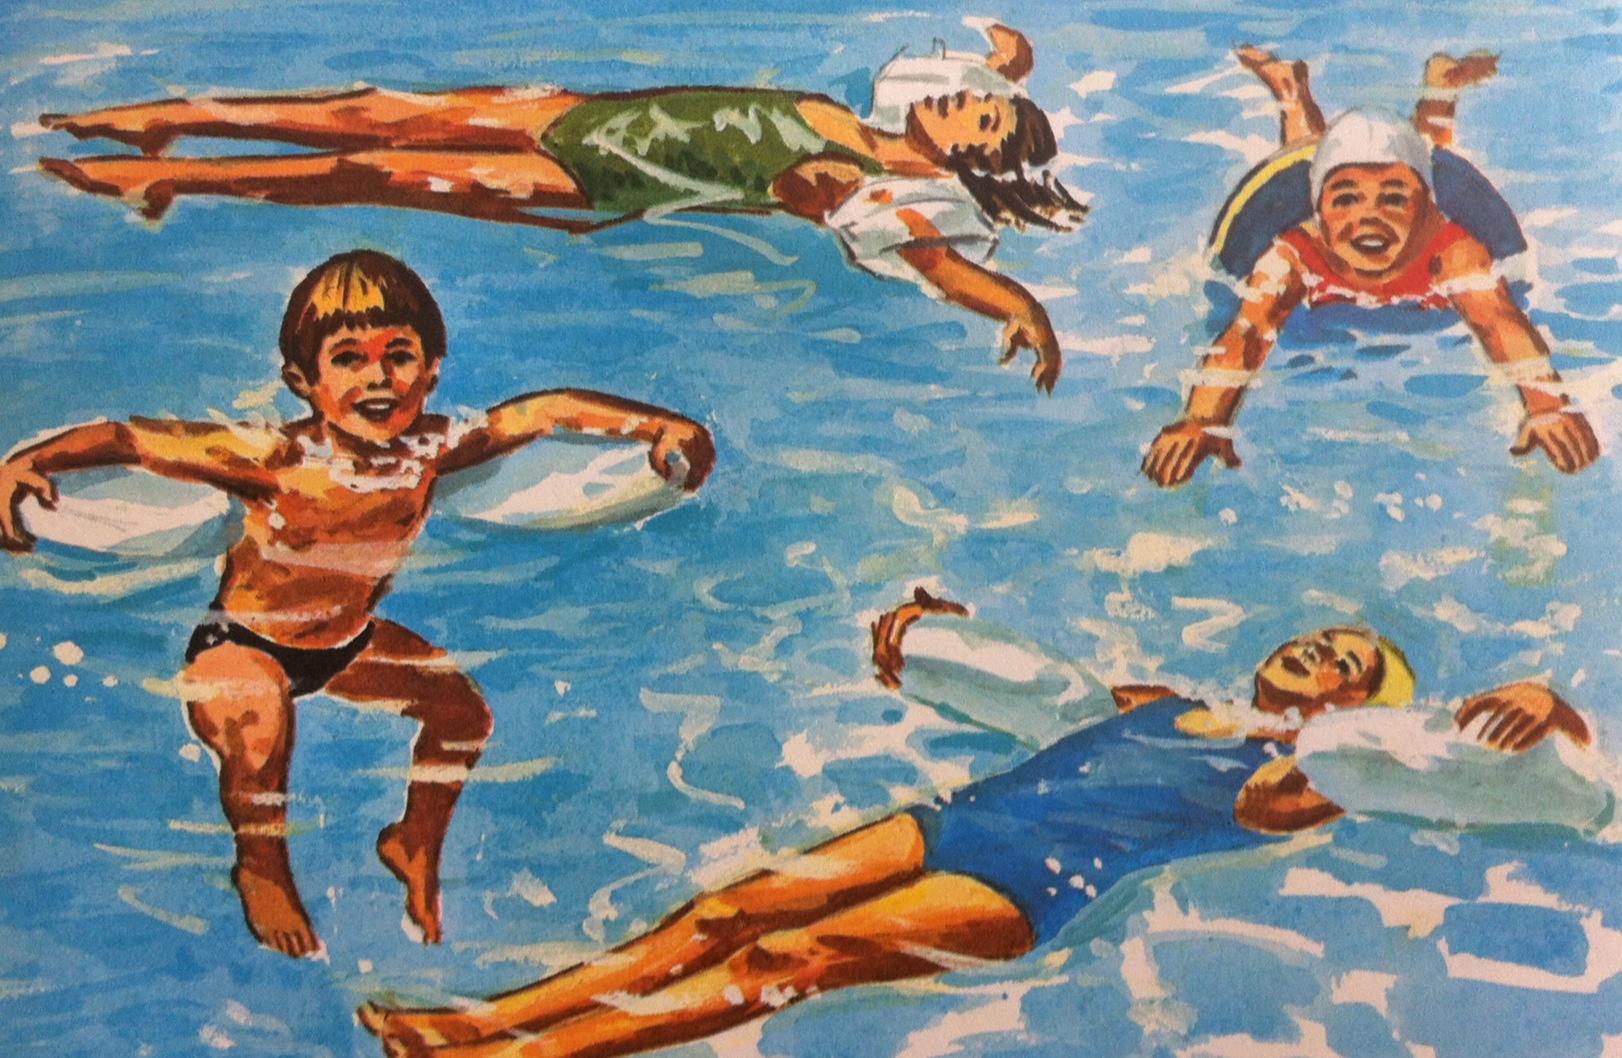 back float pool scene drawing